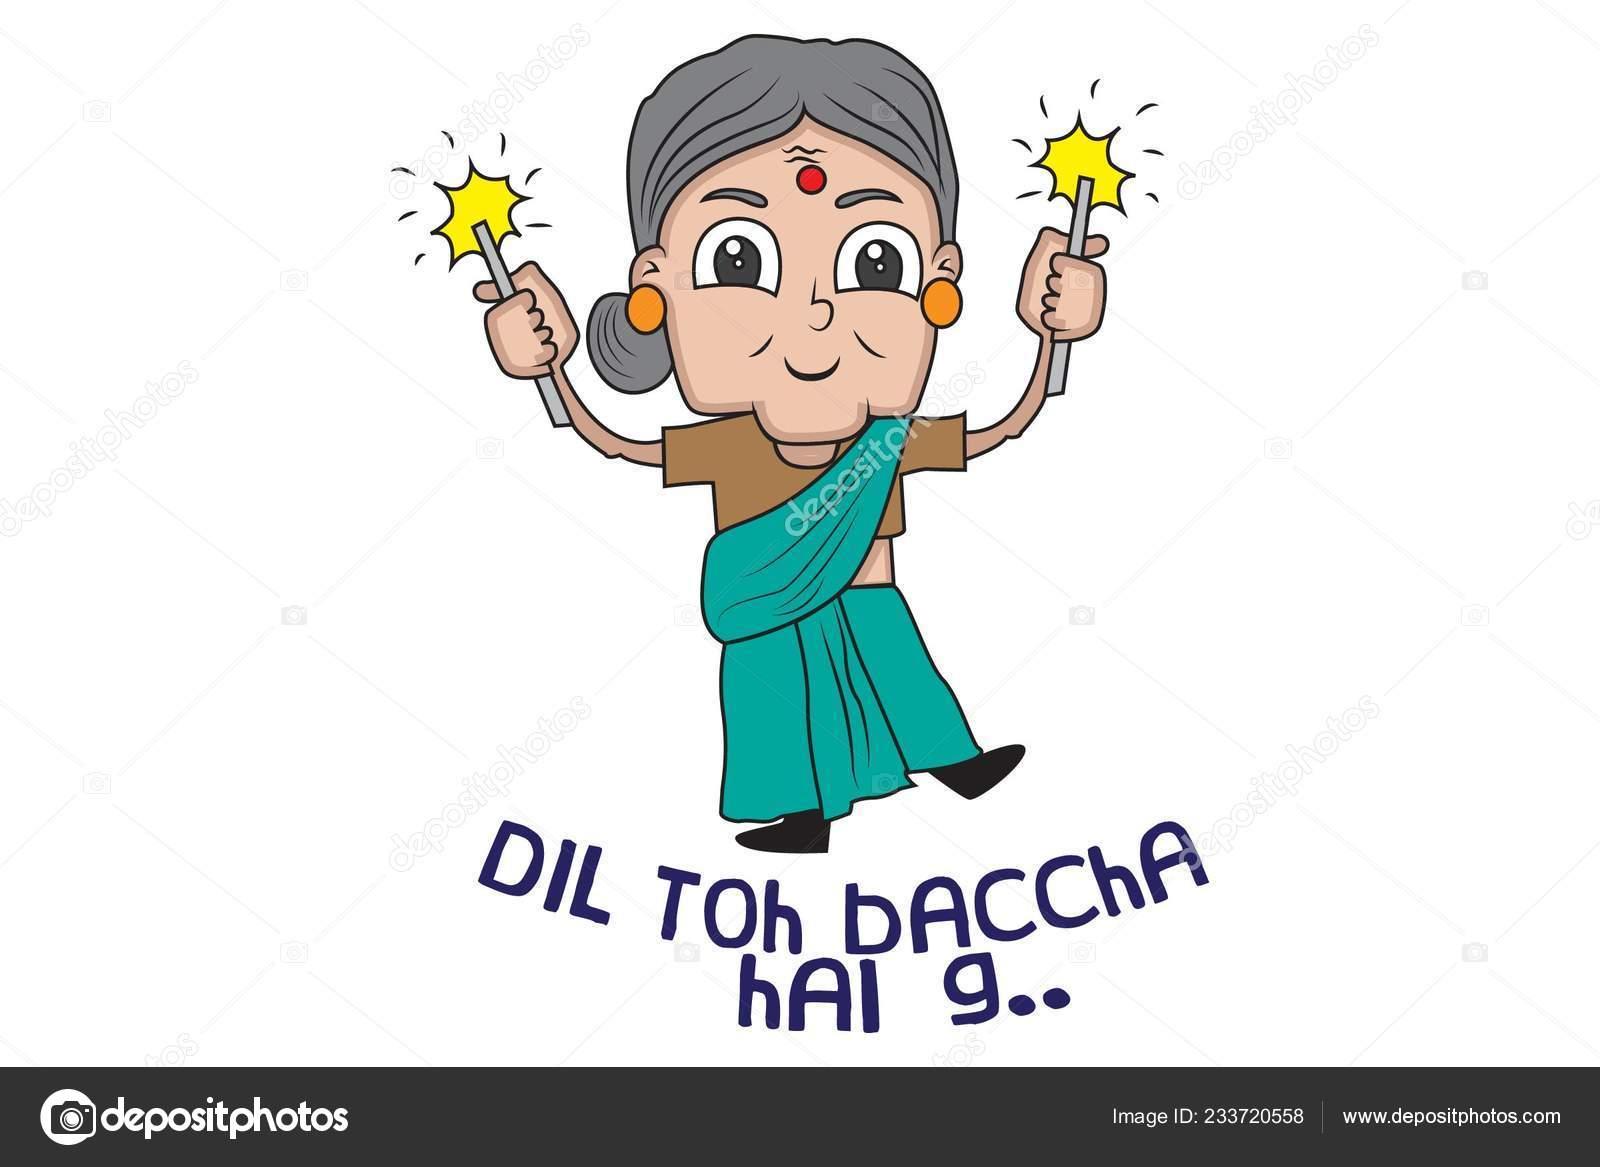 Frohe Weihnachten Hindi.Dil Toh Baccha Hai Hindi Text Ubersetzung Heart Ist Kind